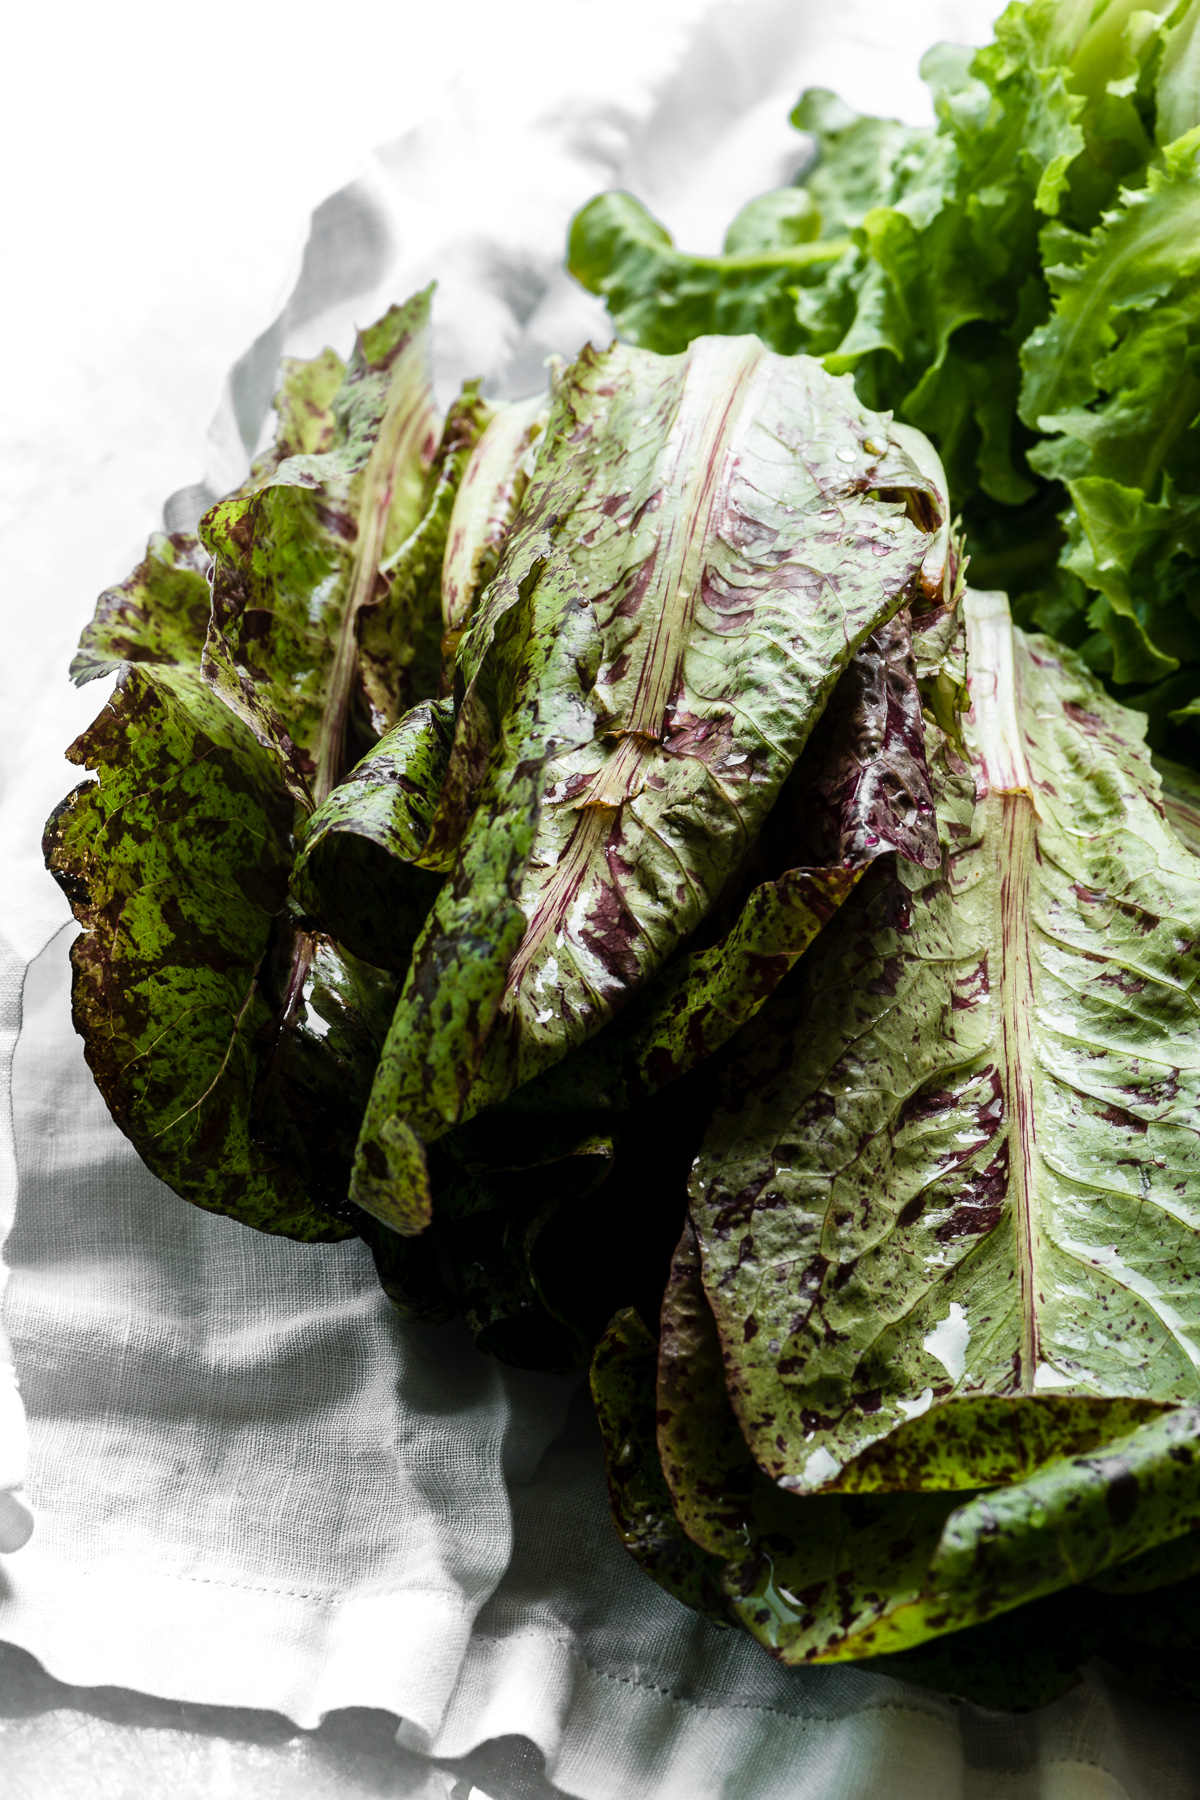 Lettuce for Spring Salad with Tarragon Dressing